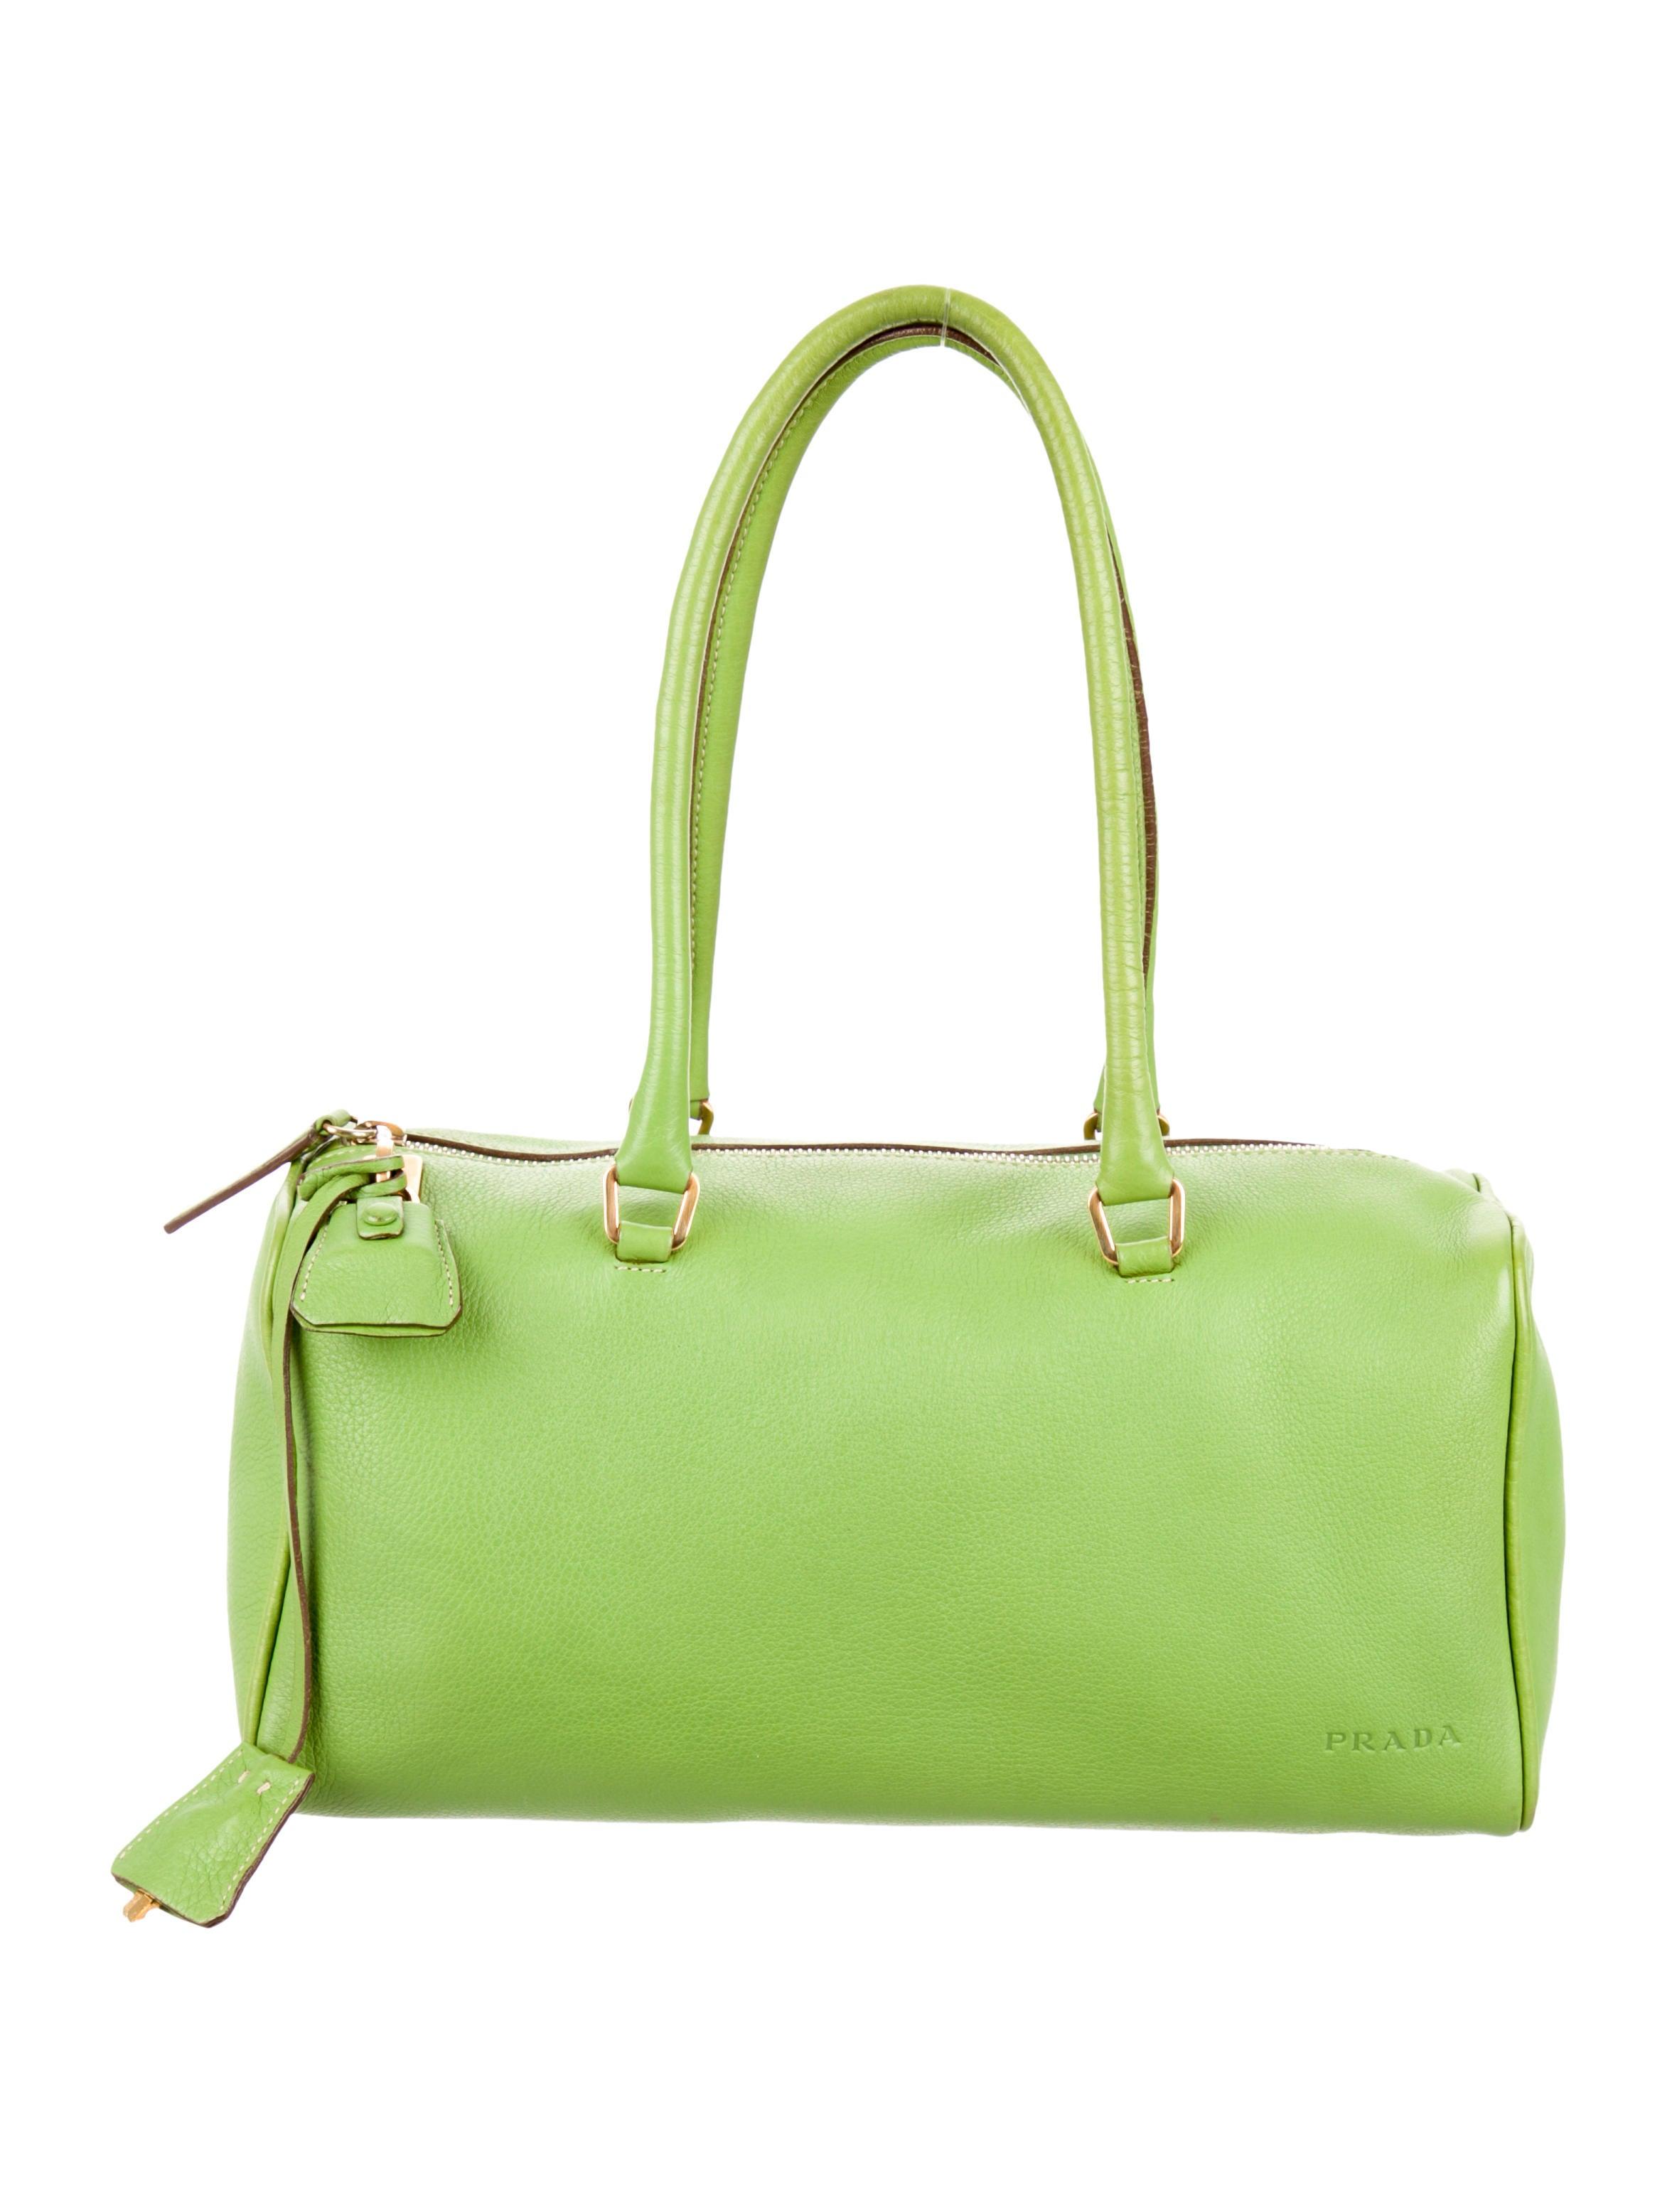 prada daino box shoulder bag